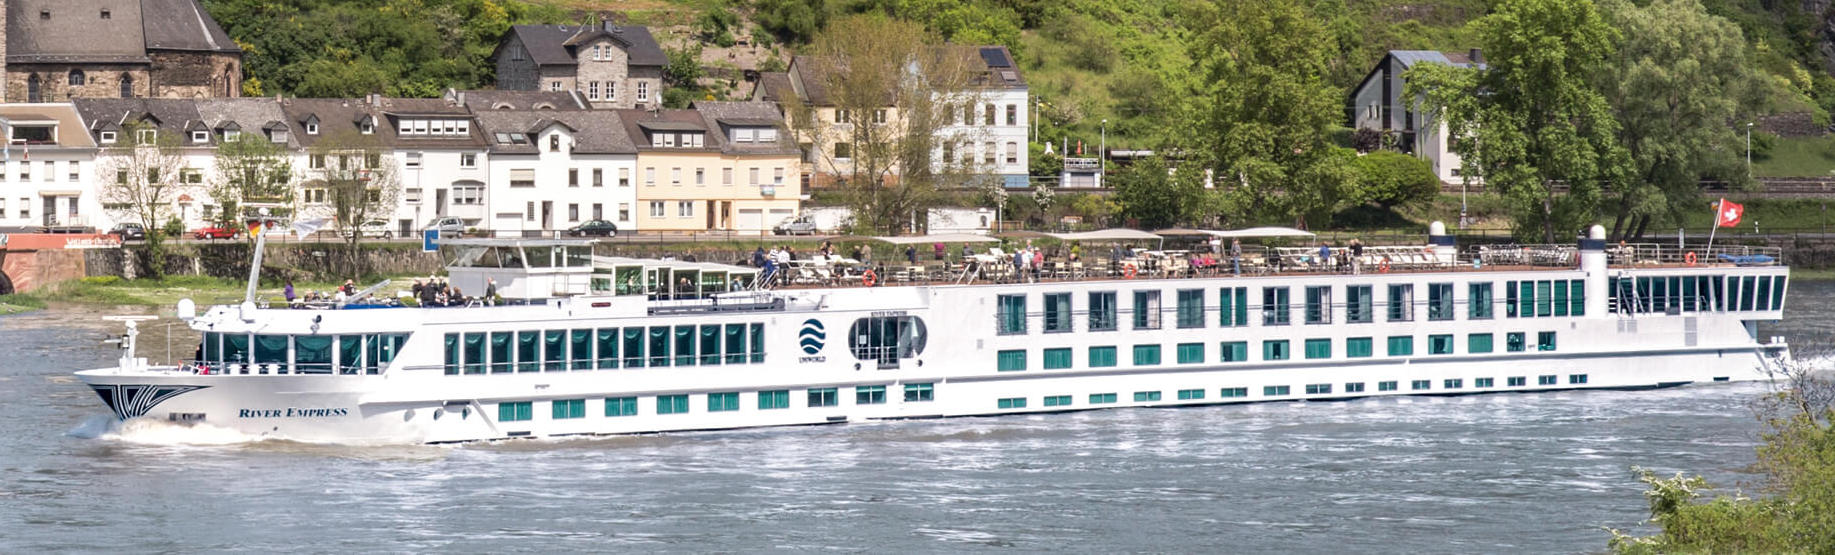 Uniworld River Empress